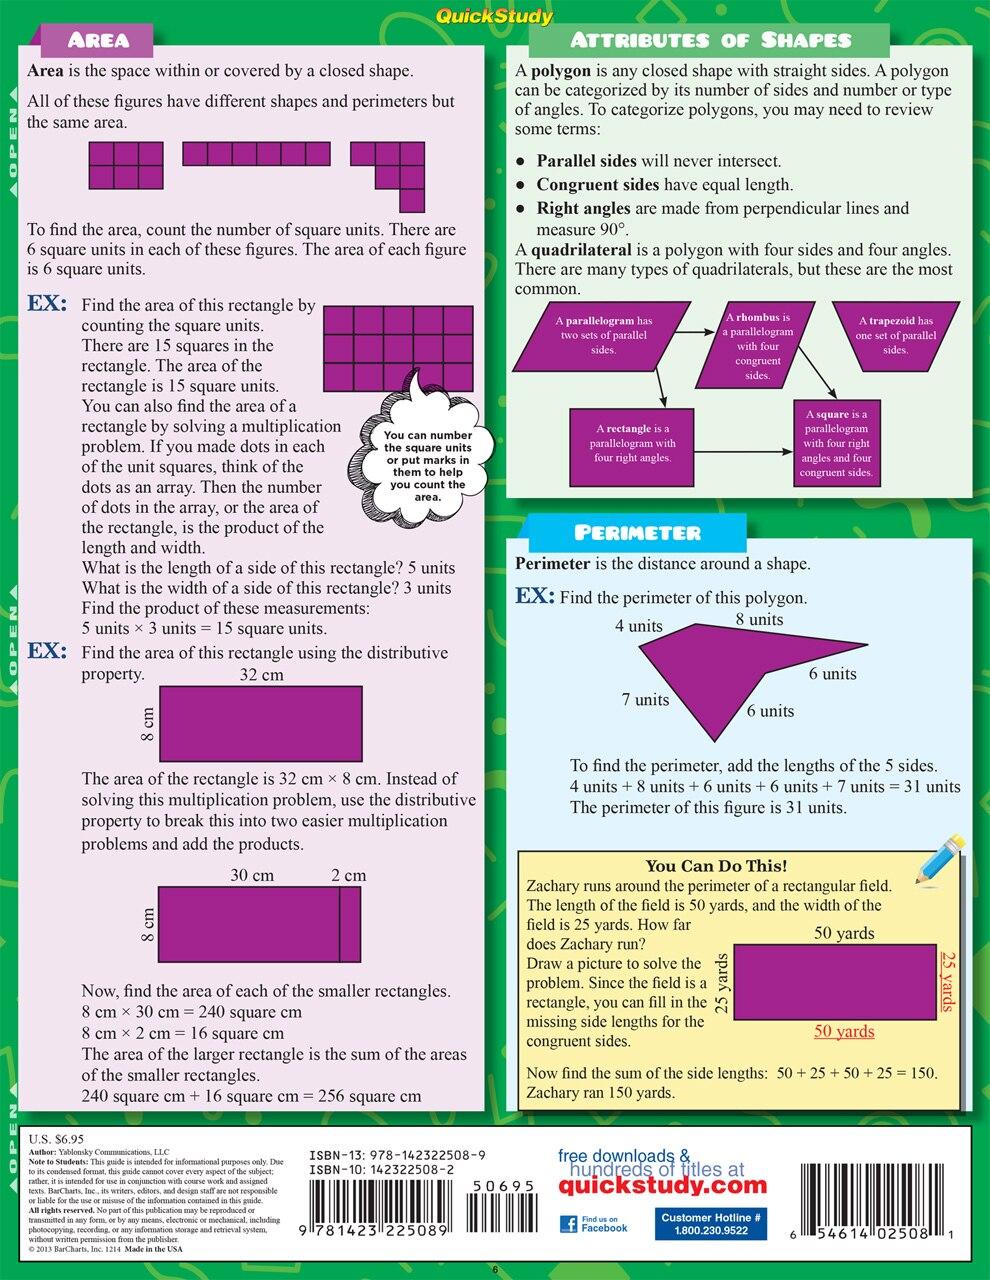 Quick Study QuickStudy Math: 3rd Grade Laminated Study Guide BarCharts Publishing Mathematics Study Outline Back Image